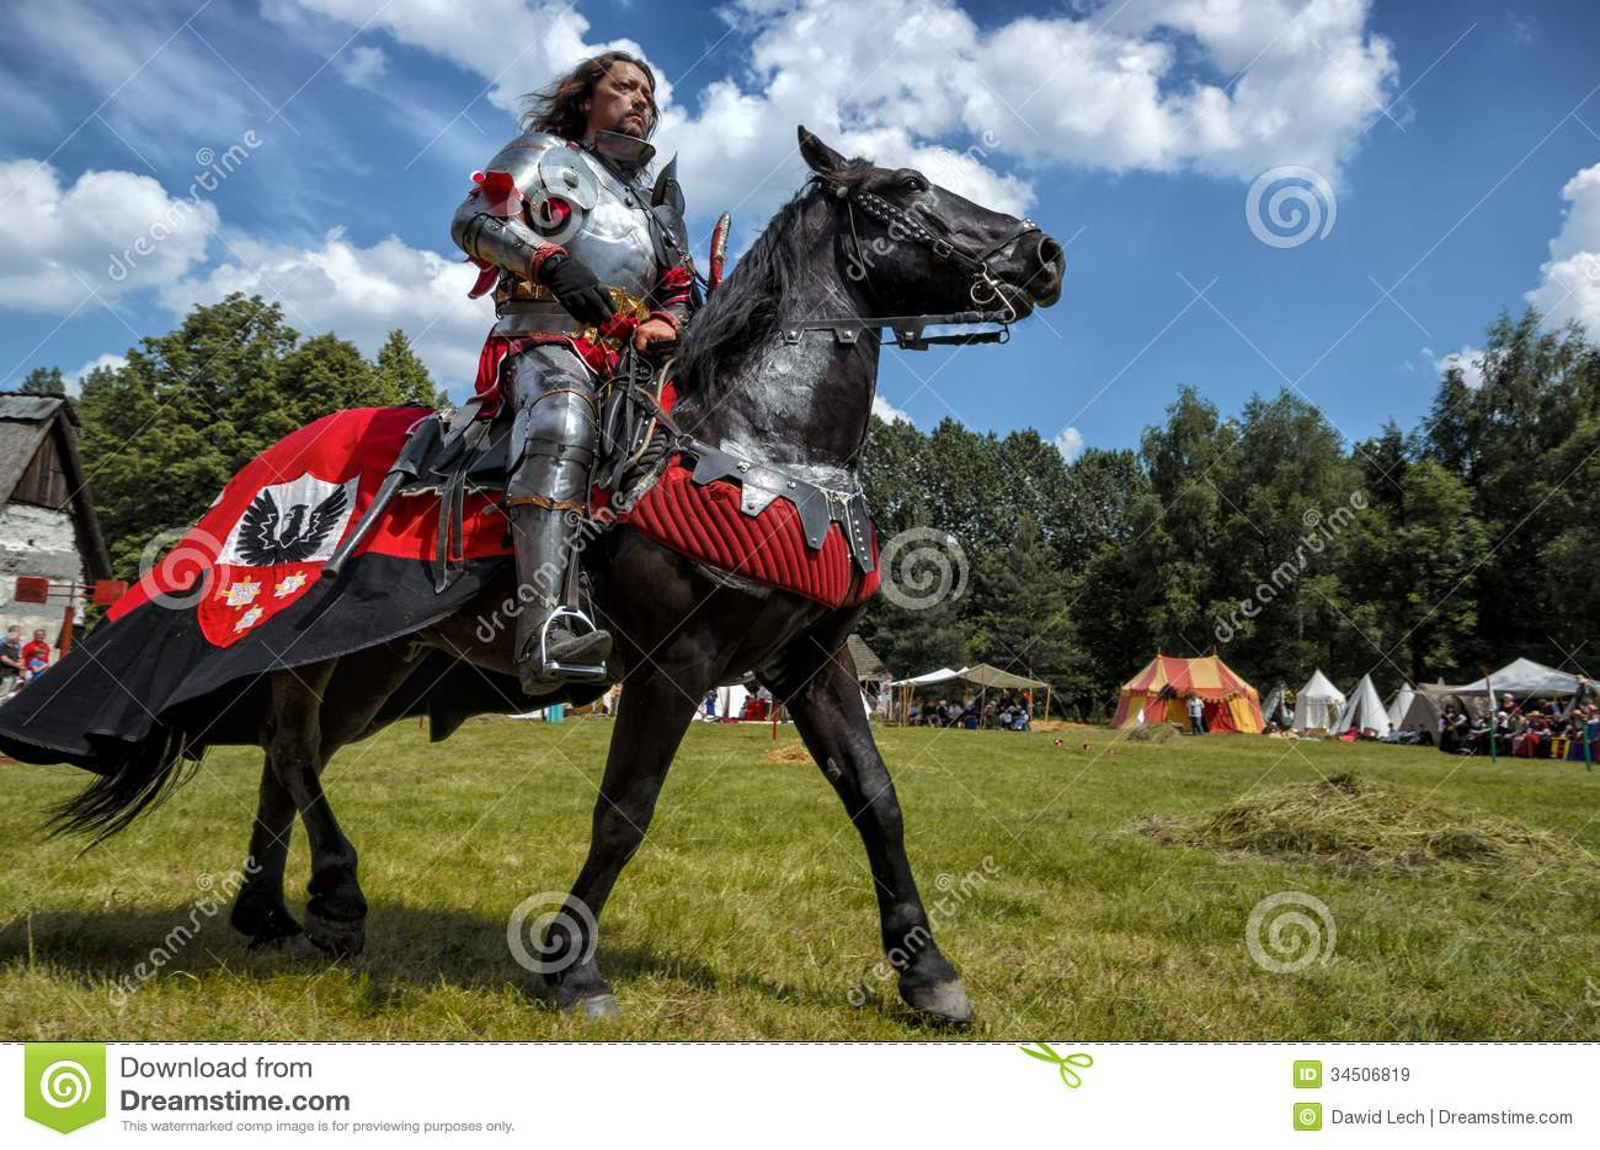 Medieval Knight On Horse Medieval knight on horseback